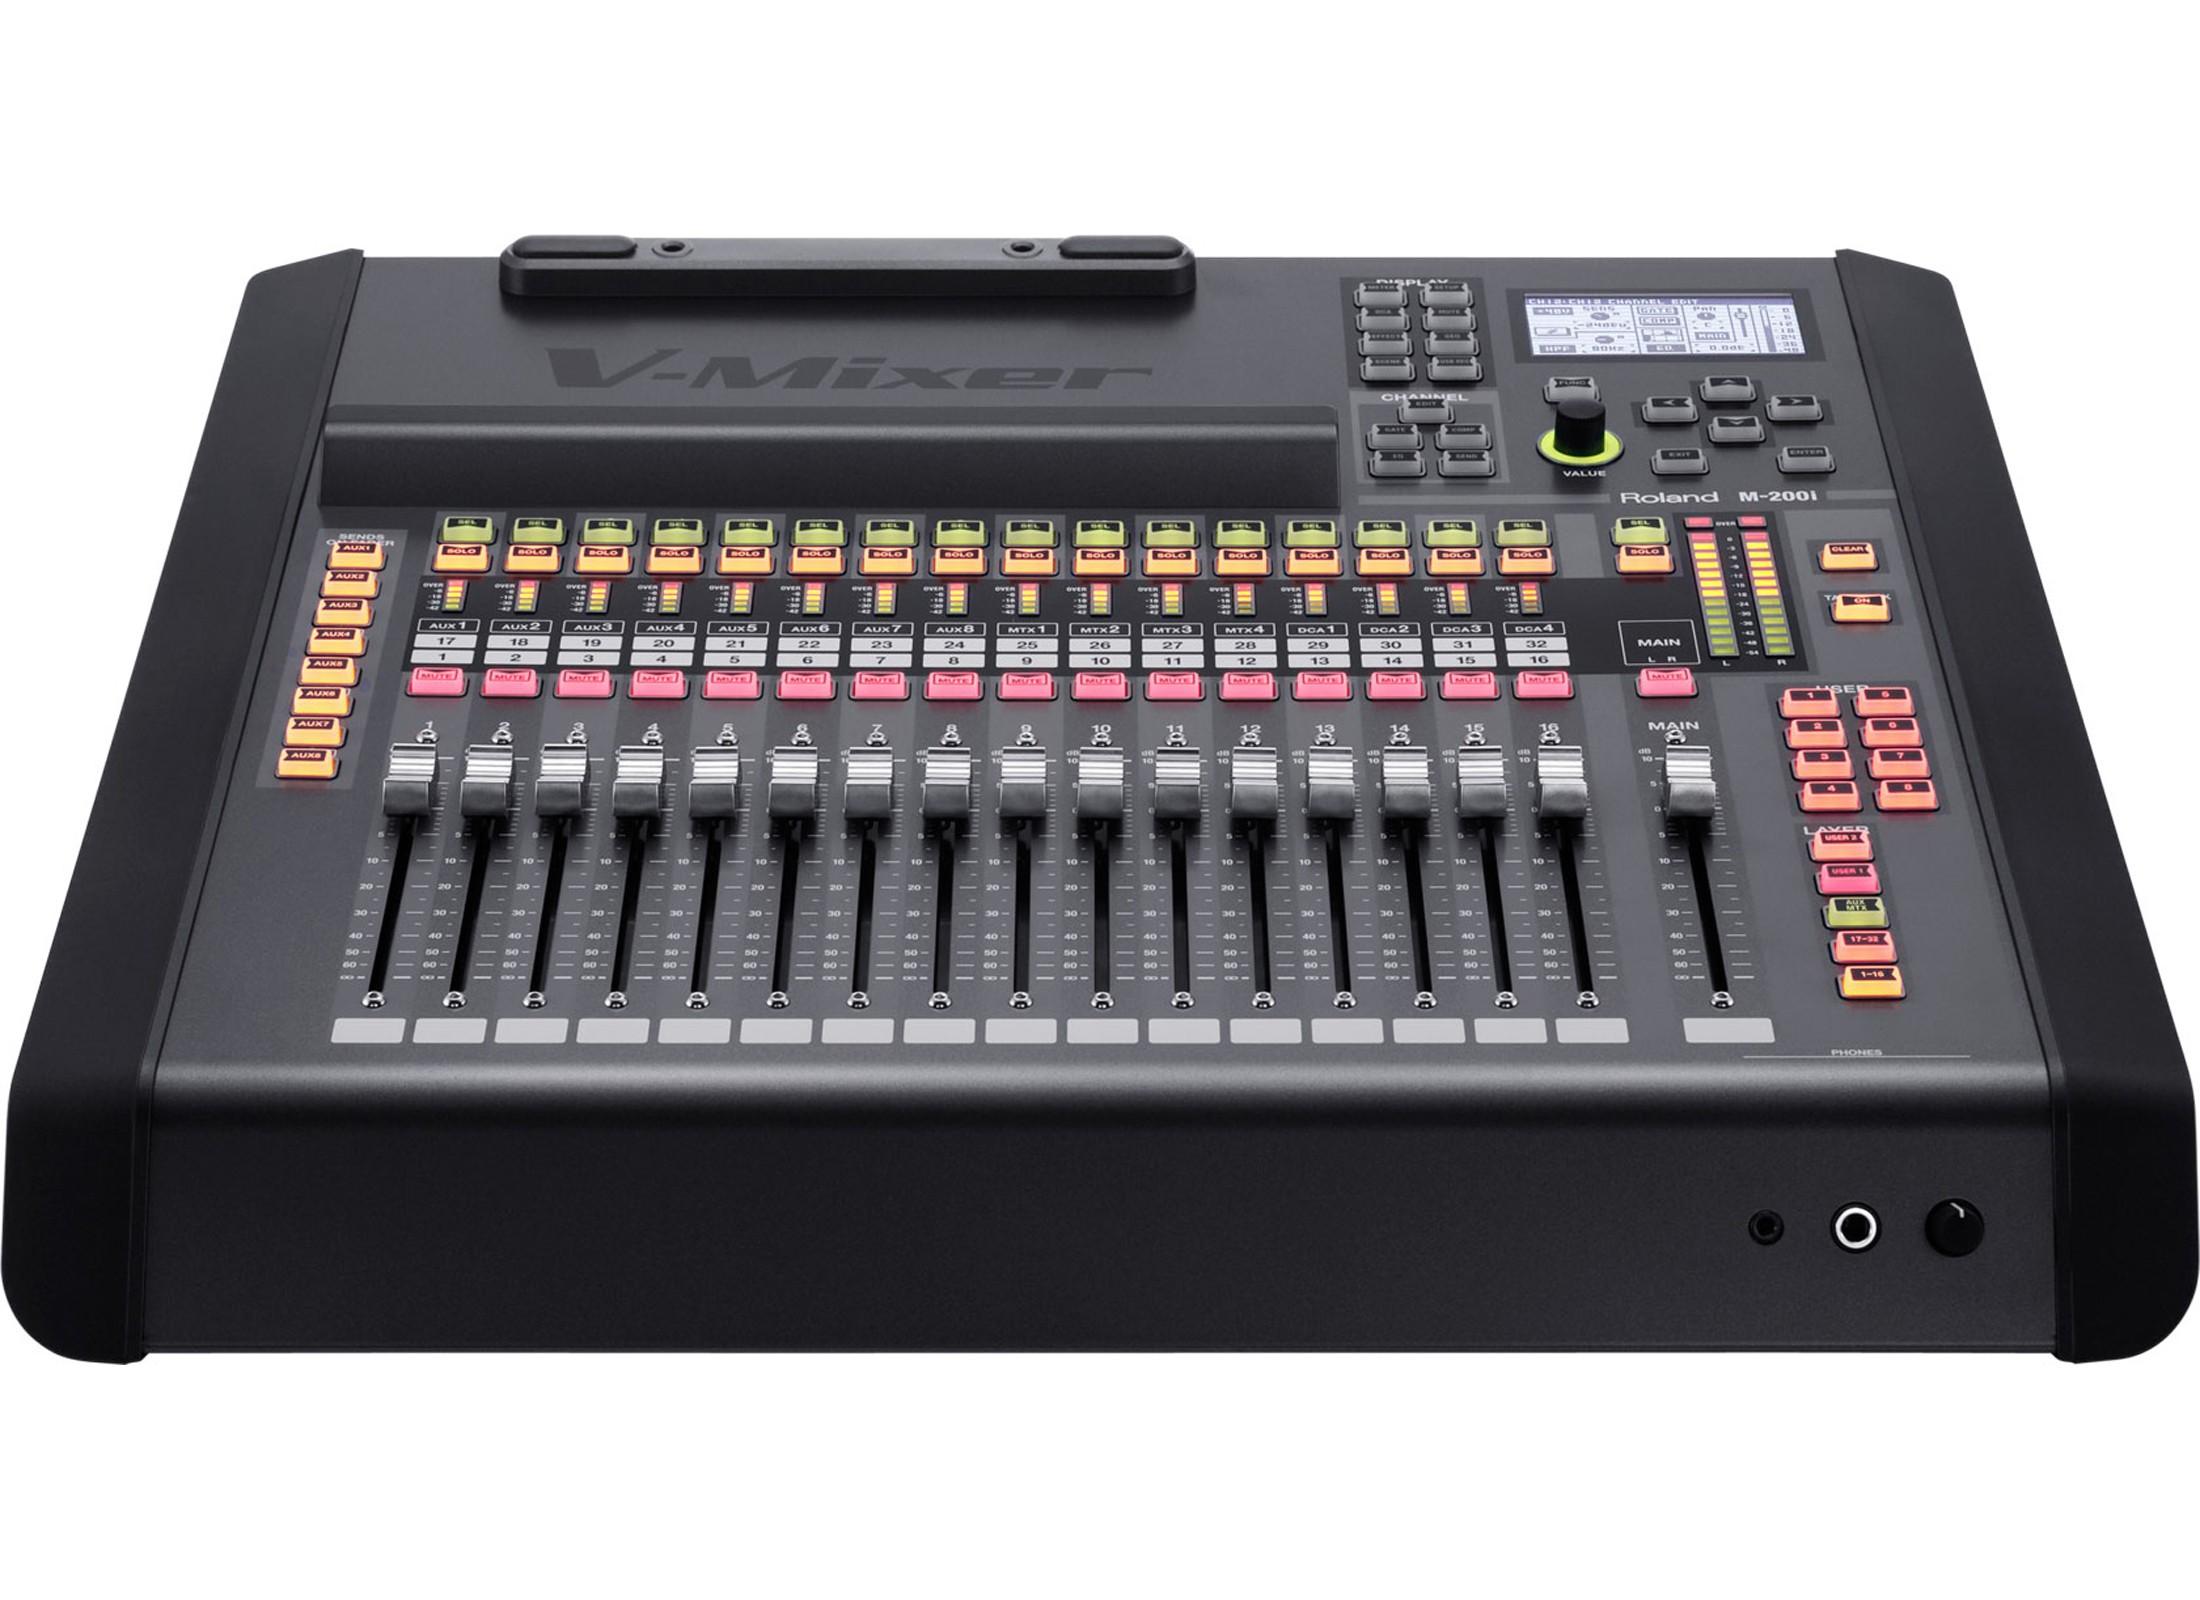 roland m 200i digital audio mixer 32 channel at huss light sound. Black Bedroom Furniture Sets. Home Design Ideas